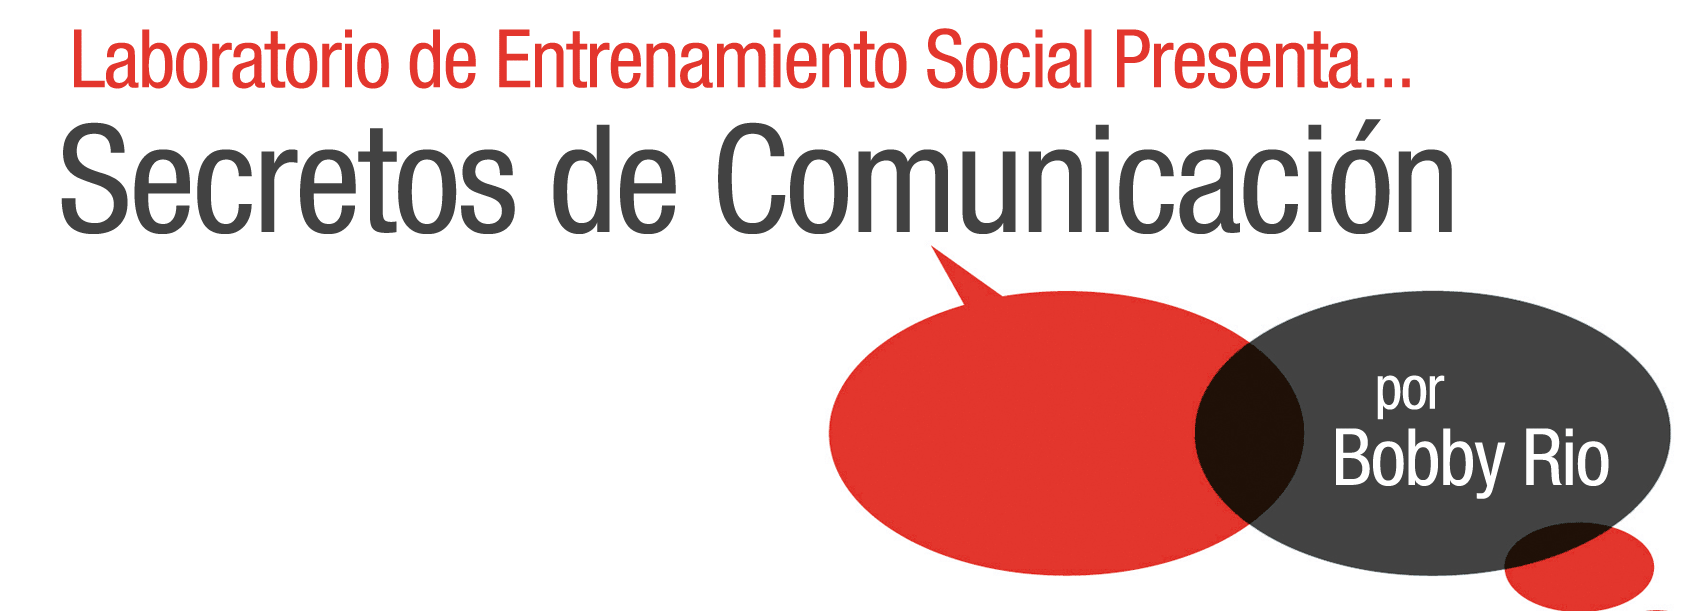 SocialTrainingLab_CommunicationSecrets_2